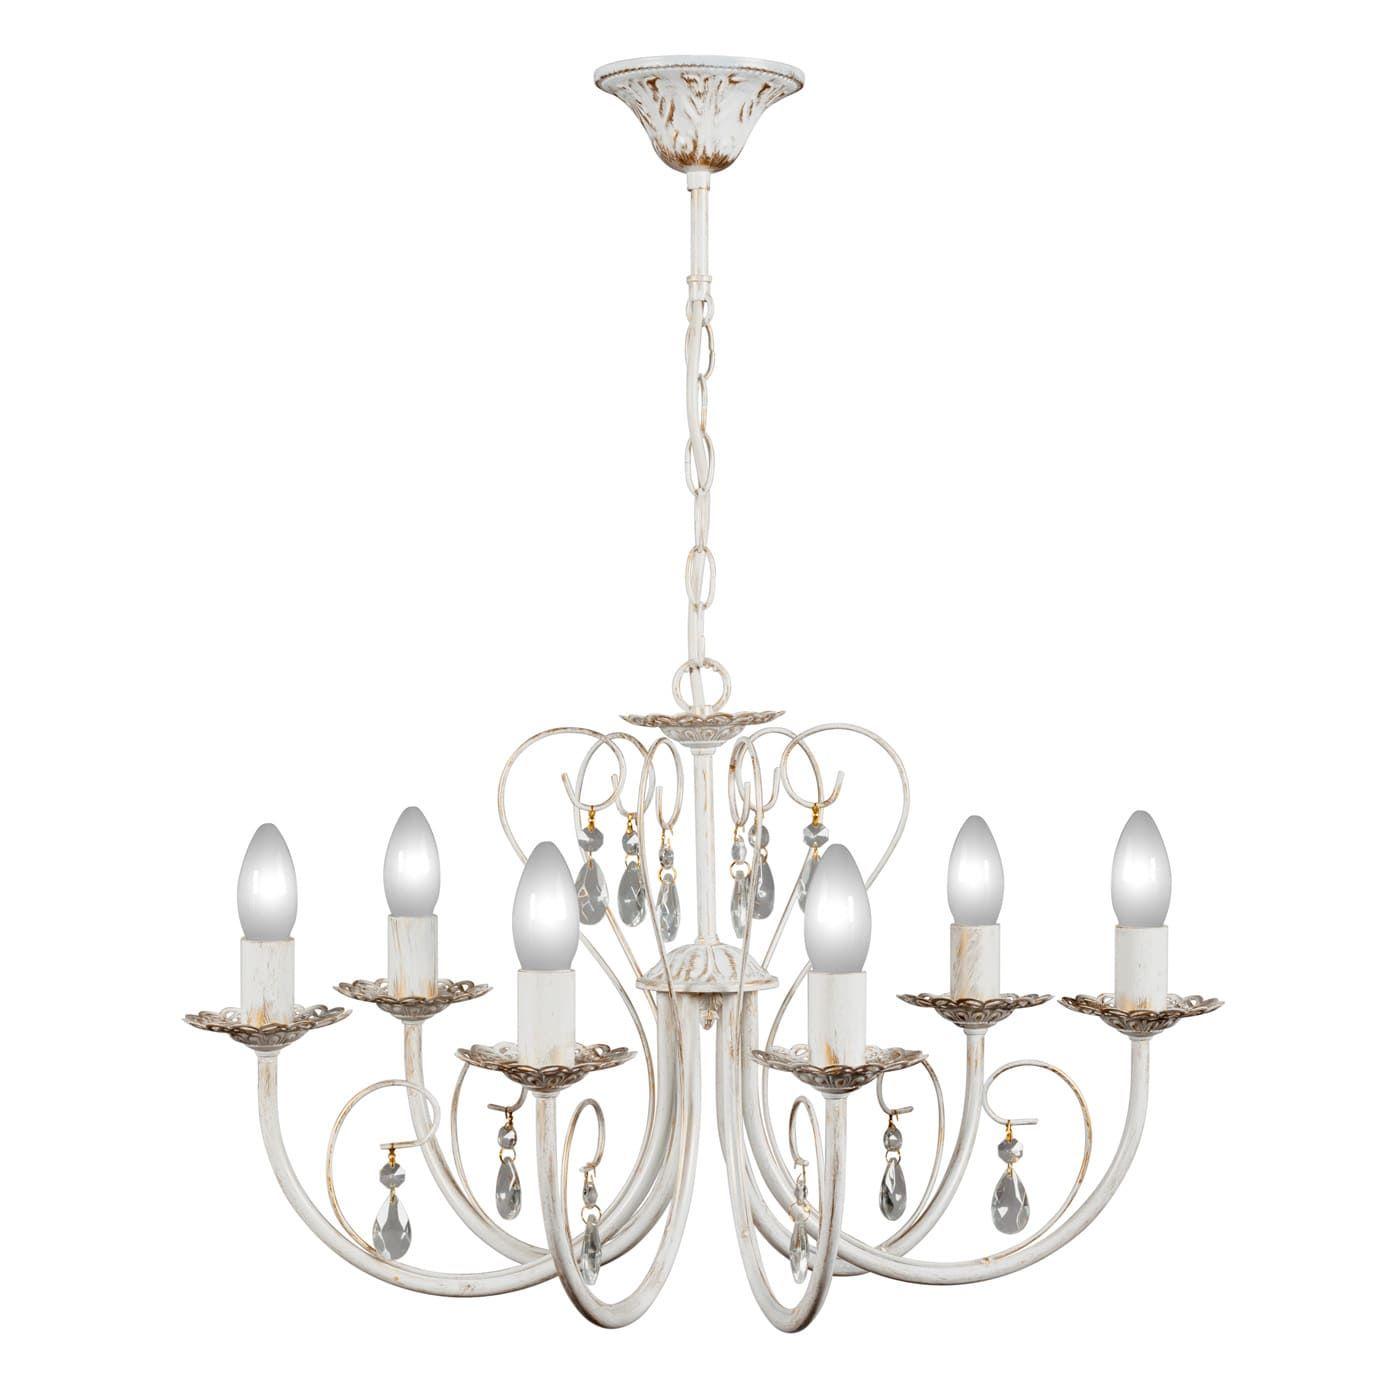 PETRASVET / Pendant chandelier S1022-6, 6xE14 max. 60W